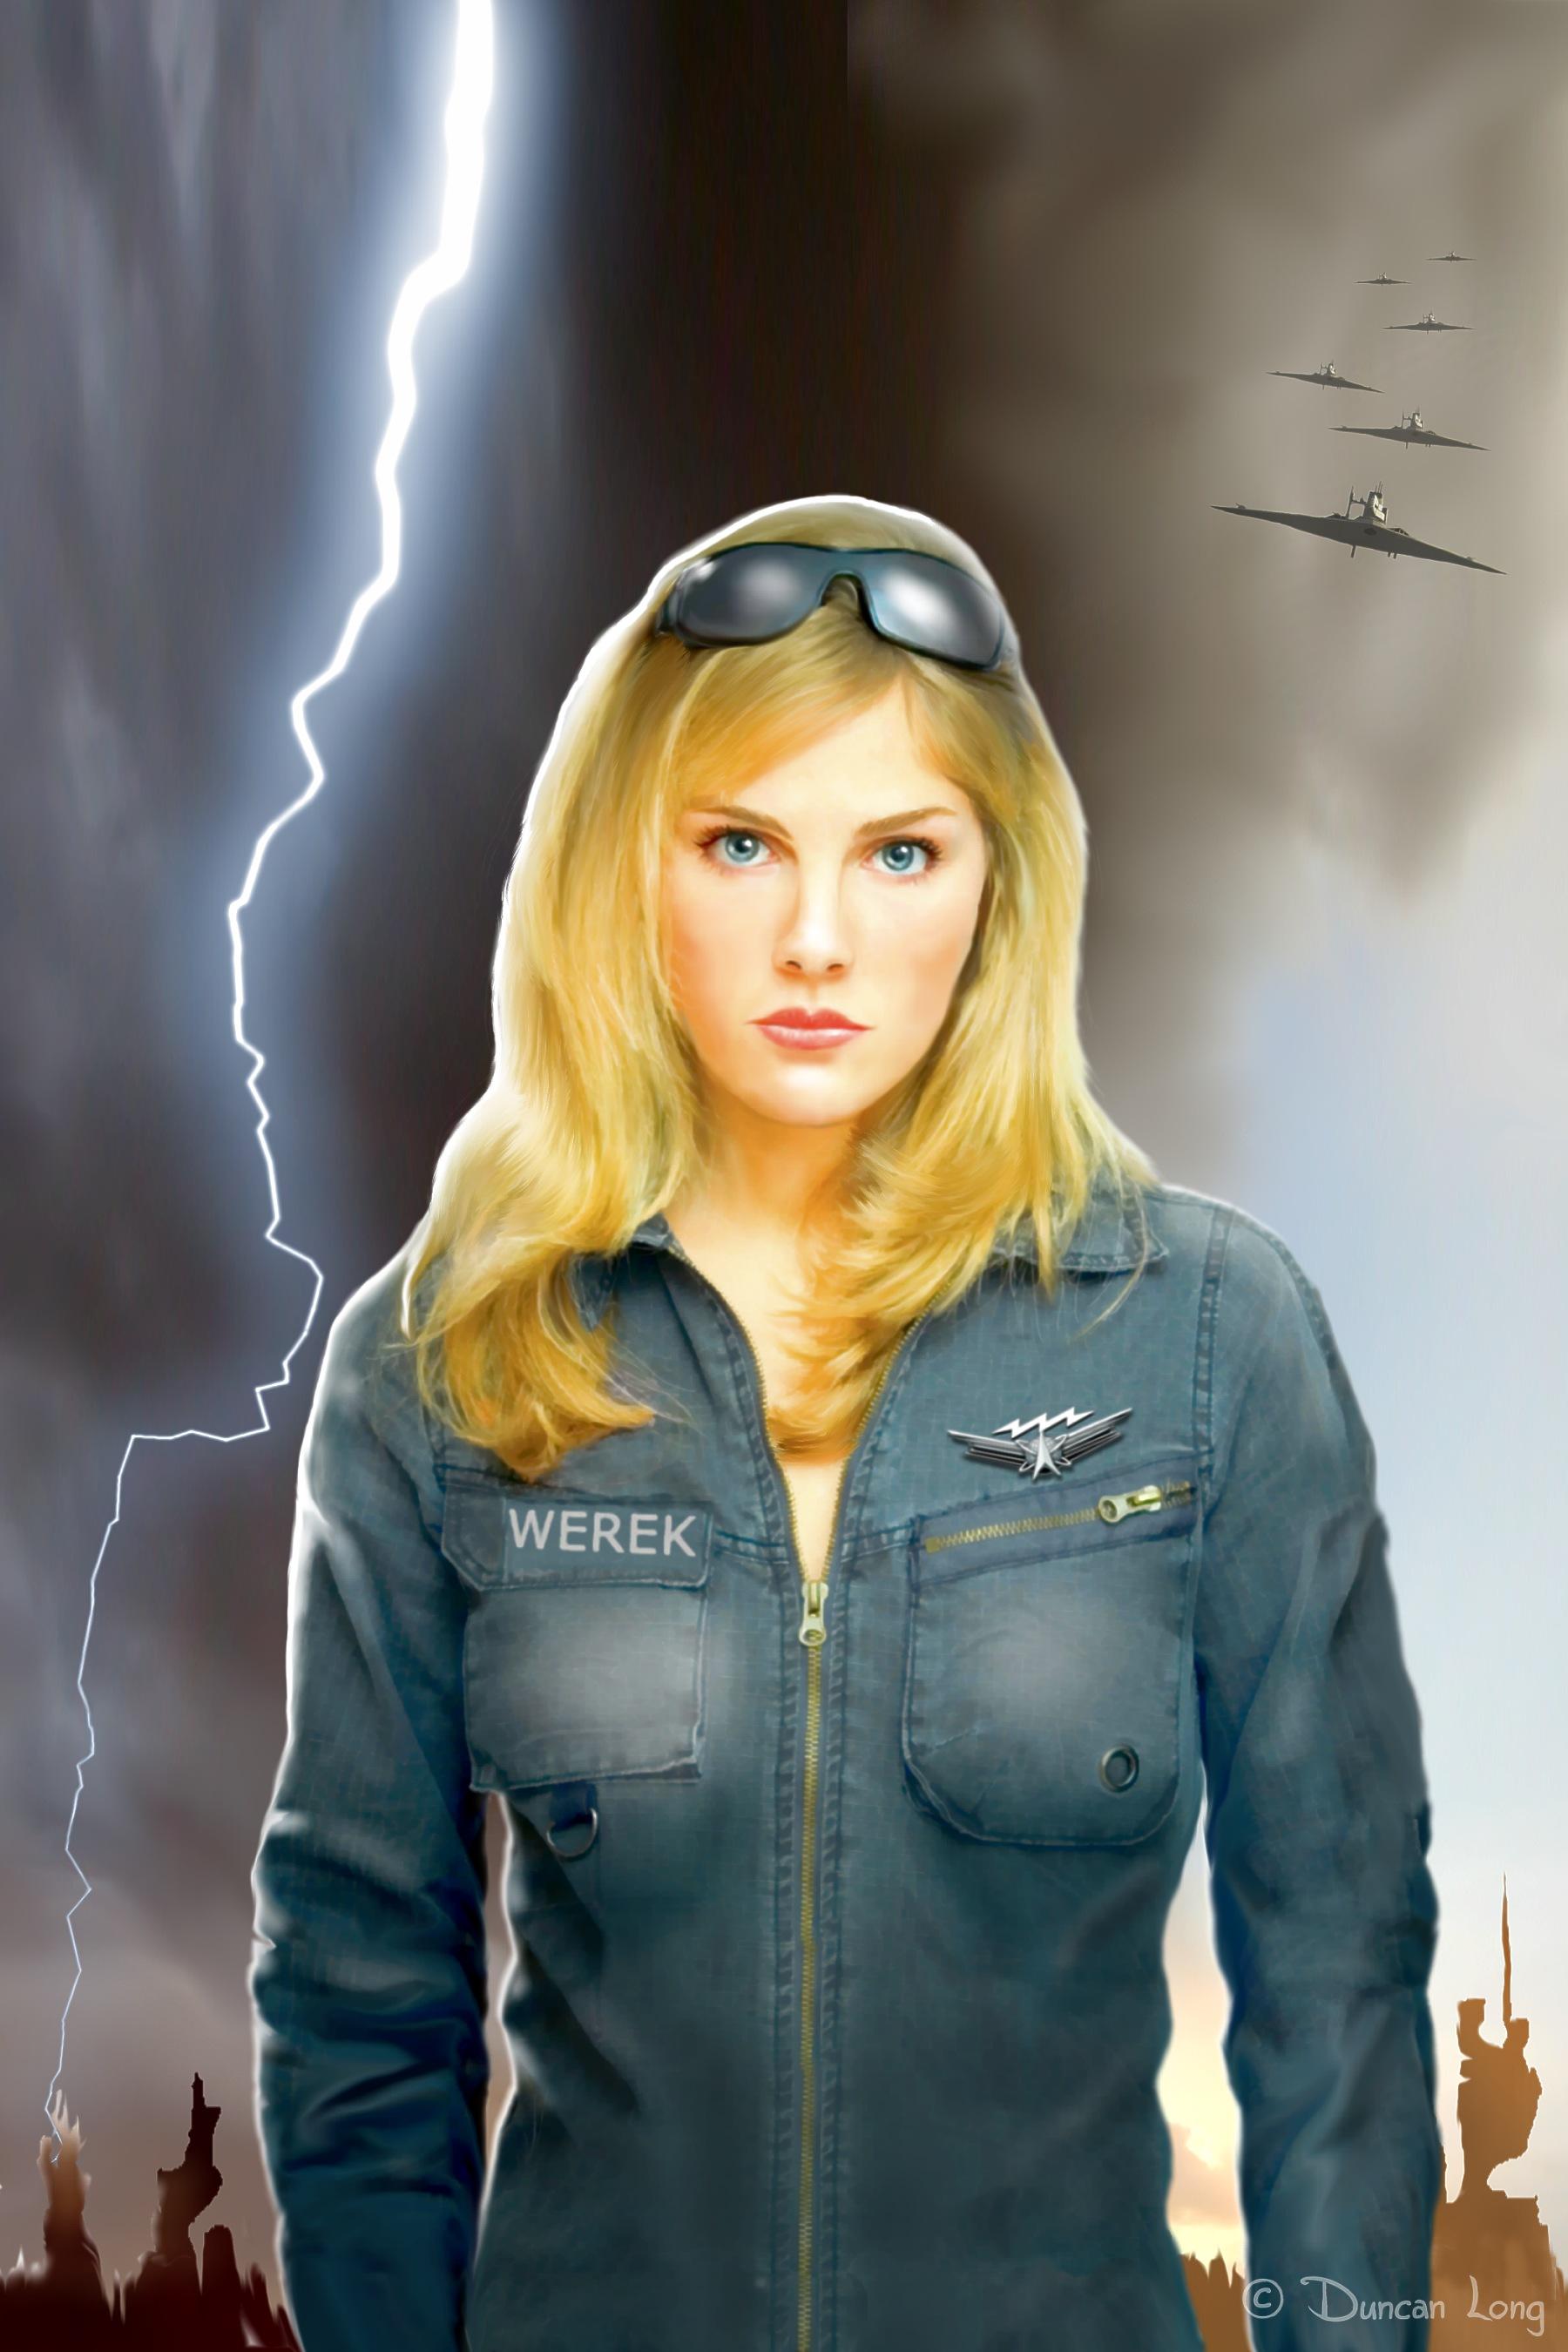 Lightning War by Duncan Long